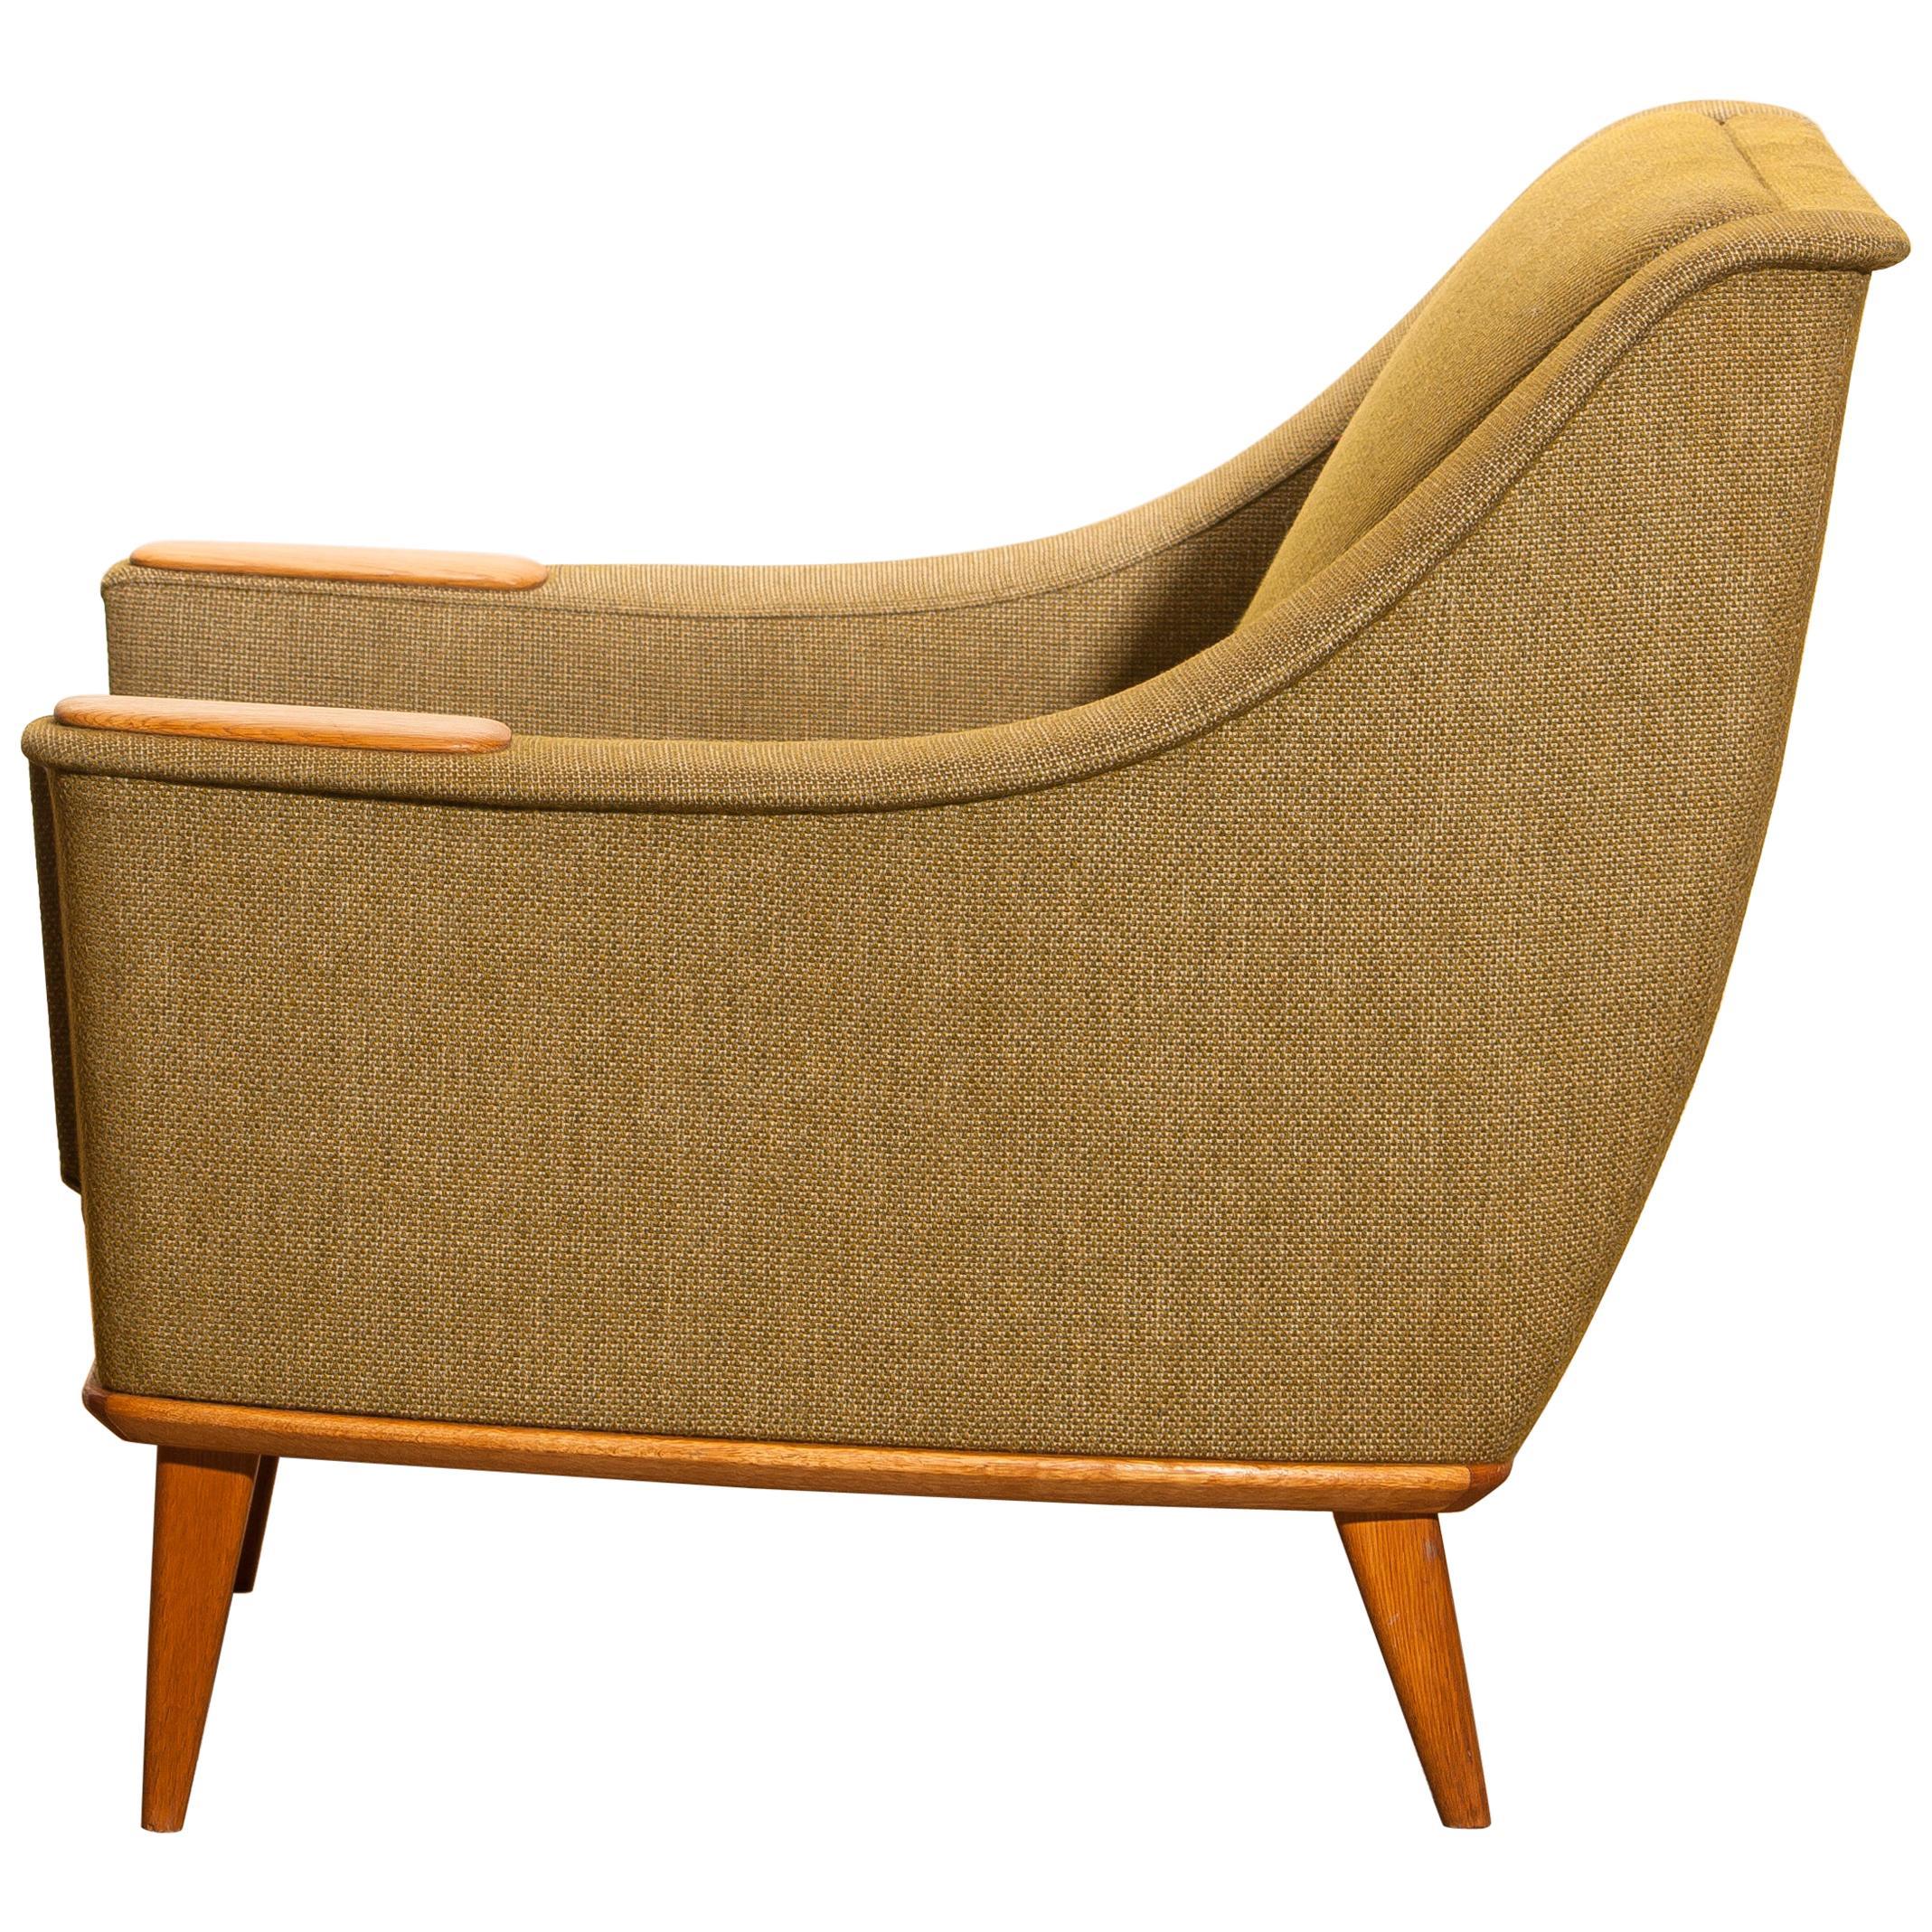 Enjoyable Folke Ohlsson Furniture Chairs Sofas Tables More 104 Machost Co Dining Chair Design Ideas Machostcouk